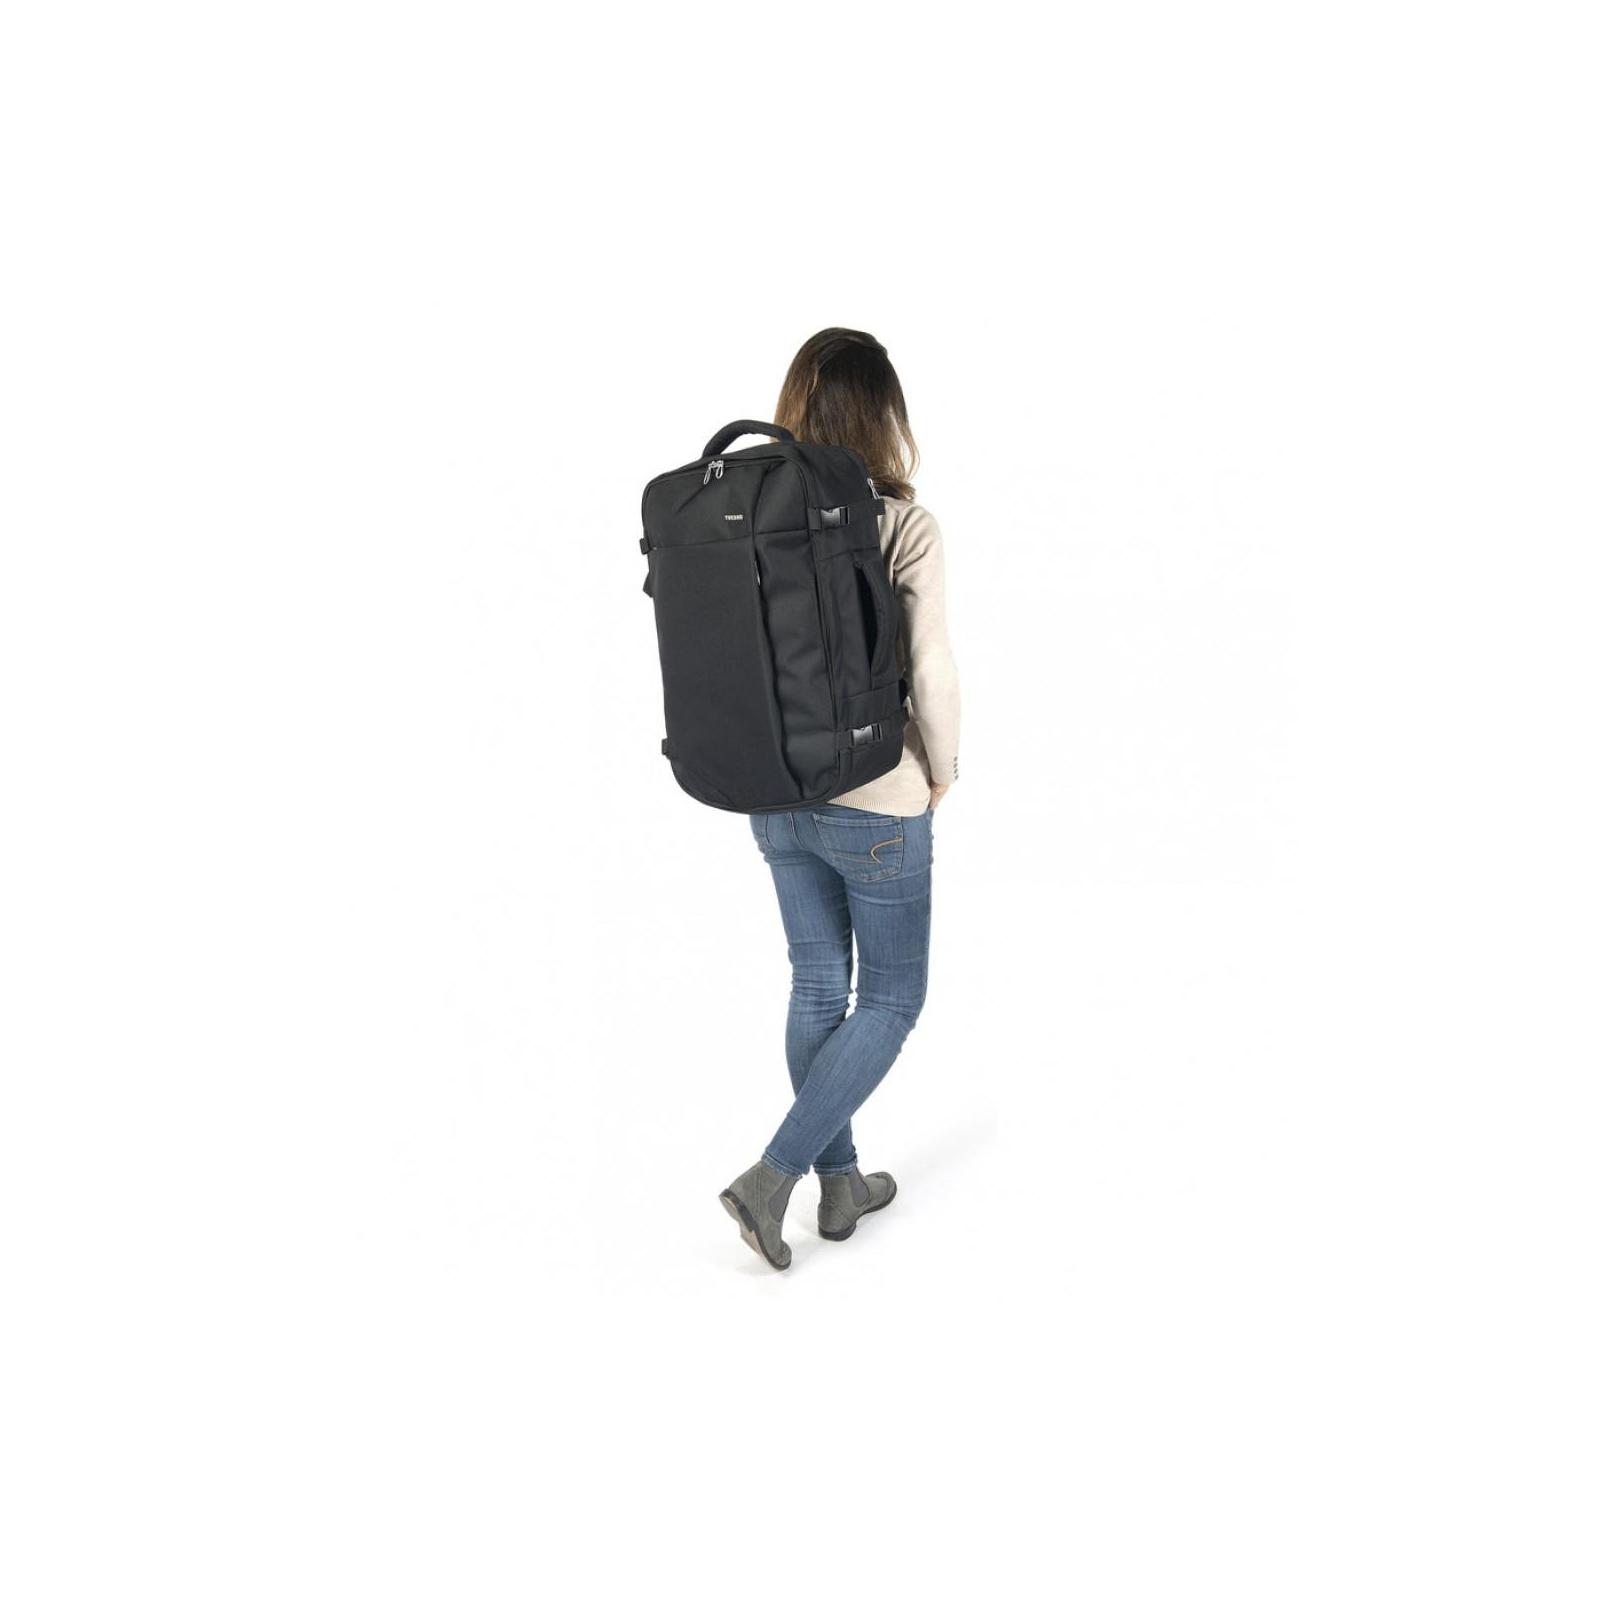 "Рюкзак для ноутбука Tucano 17.3"" TUGO' L CABIN black (BKTUG-L-BK) изображение 7"